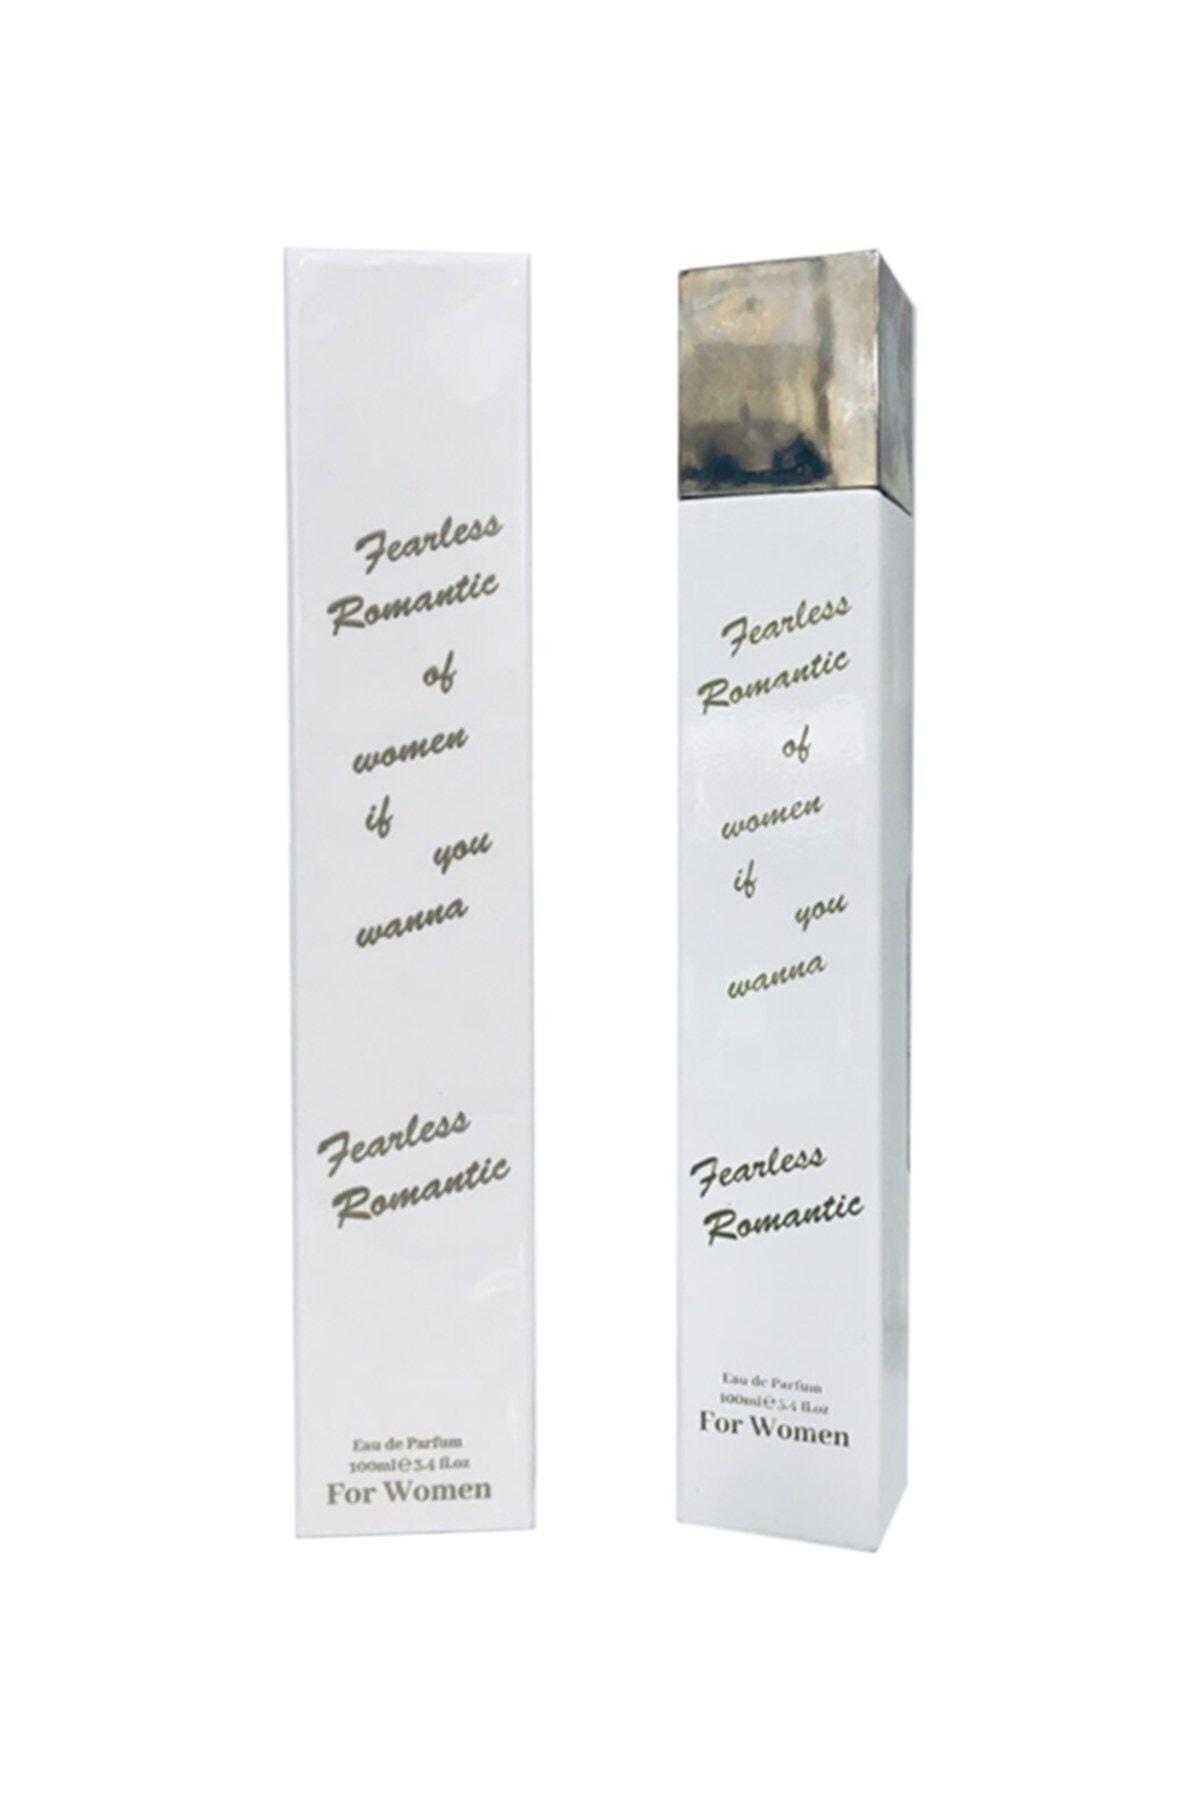 NeoandTeo Fearless Romantic 100 Ml Edp Kadın Beyaz Parfüm 1